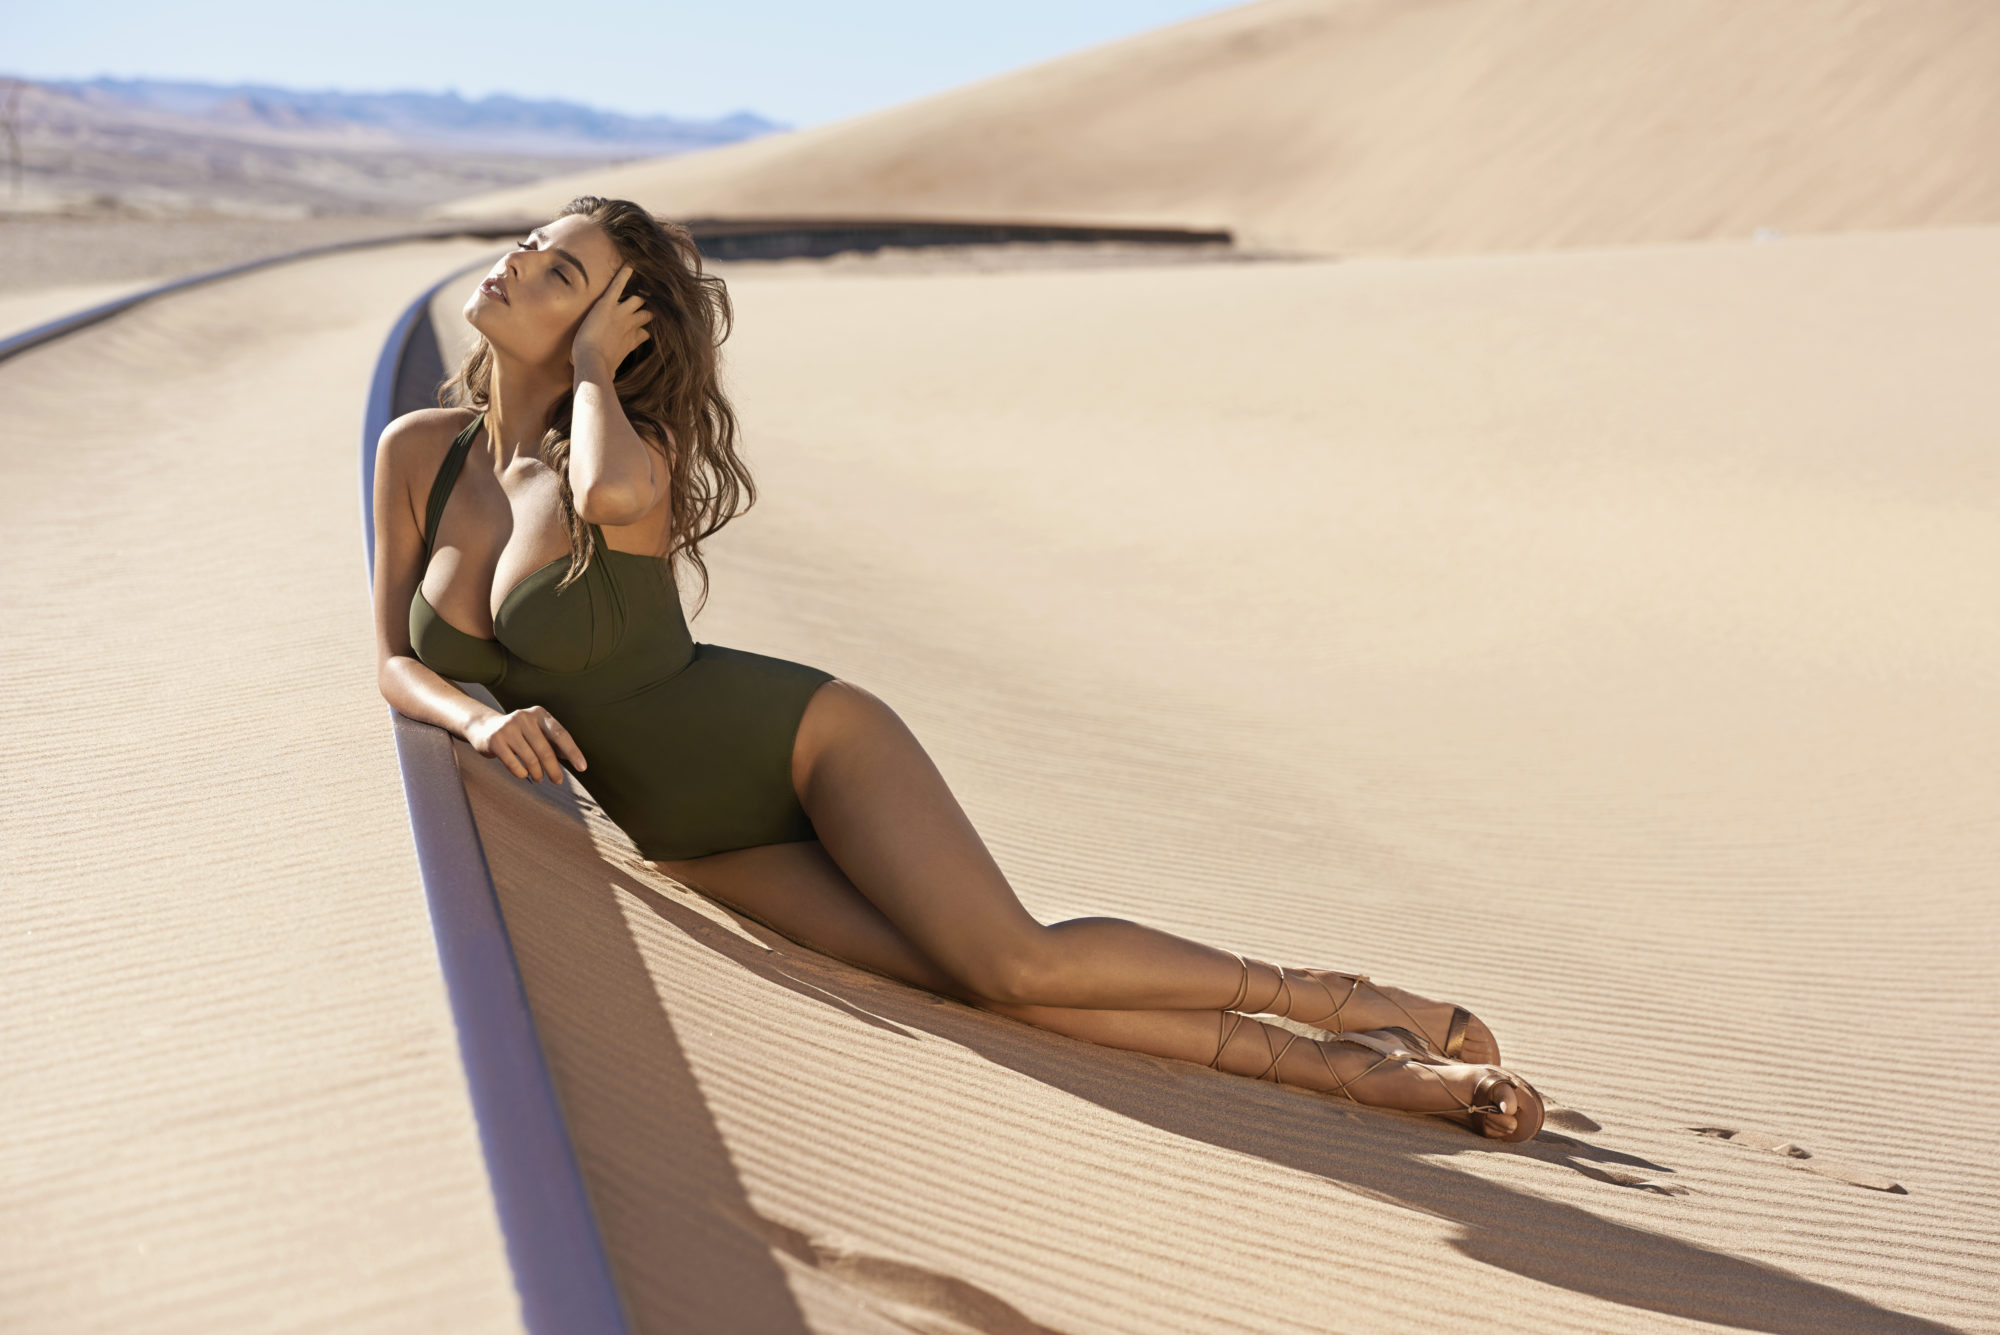 Alice Peneaca / Pain de Sucre Campaign / Namibie Swimwear / Maillot de bain